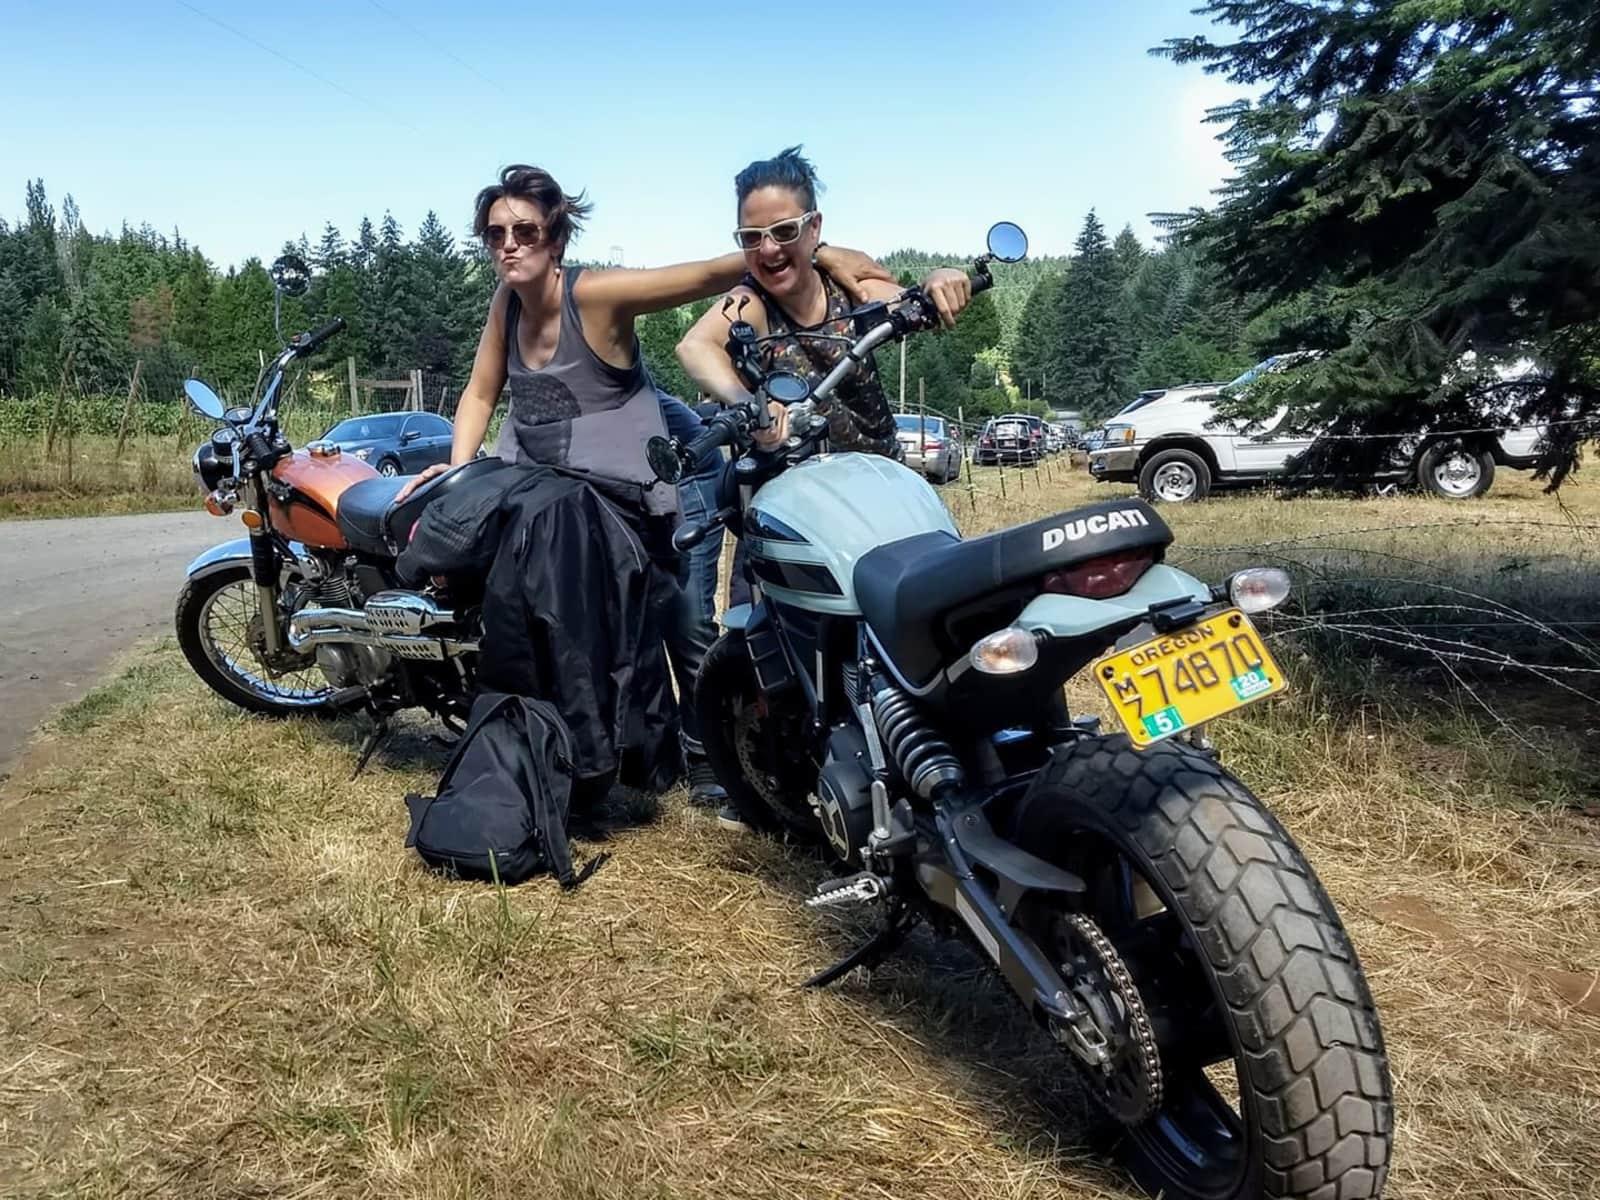 Lisa & andrea & Andrea from Portland, Oregon, United States